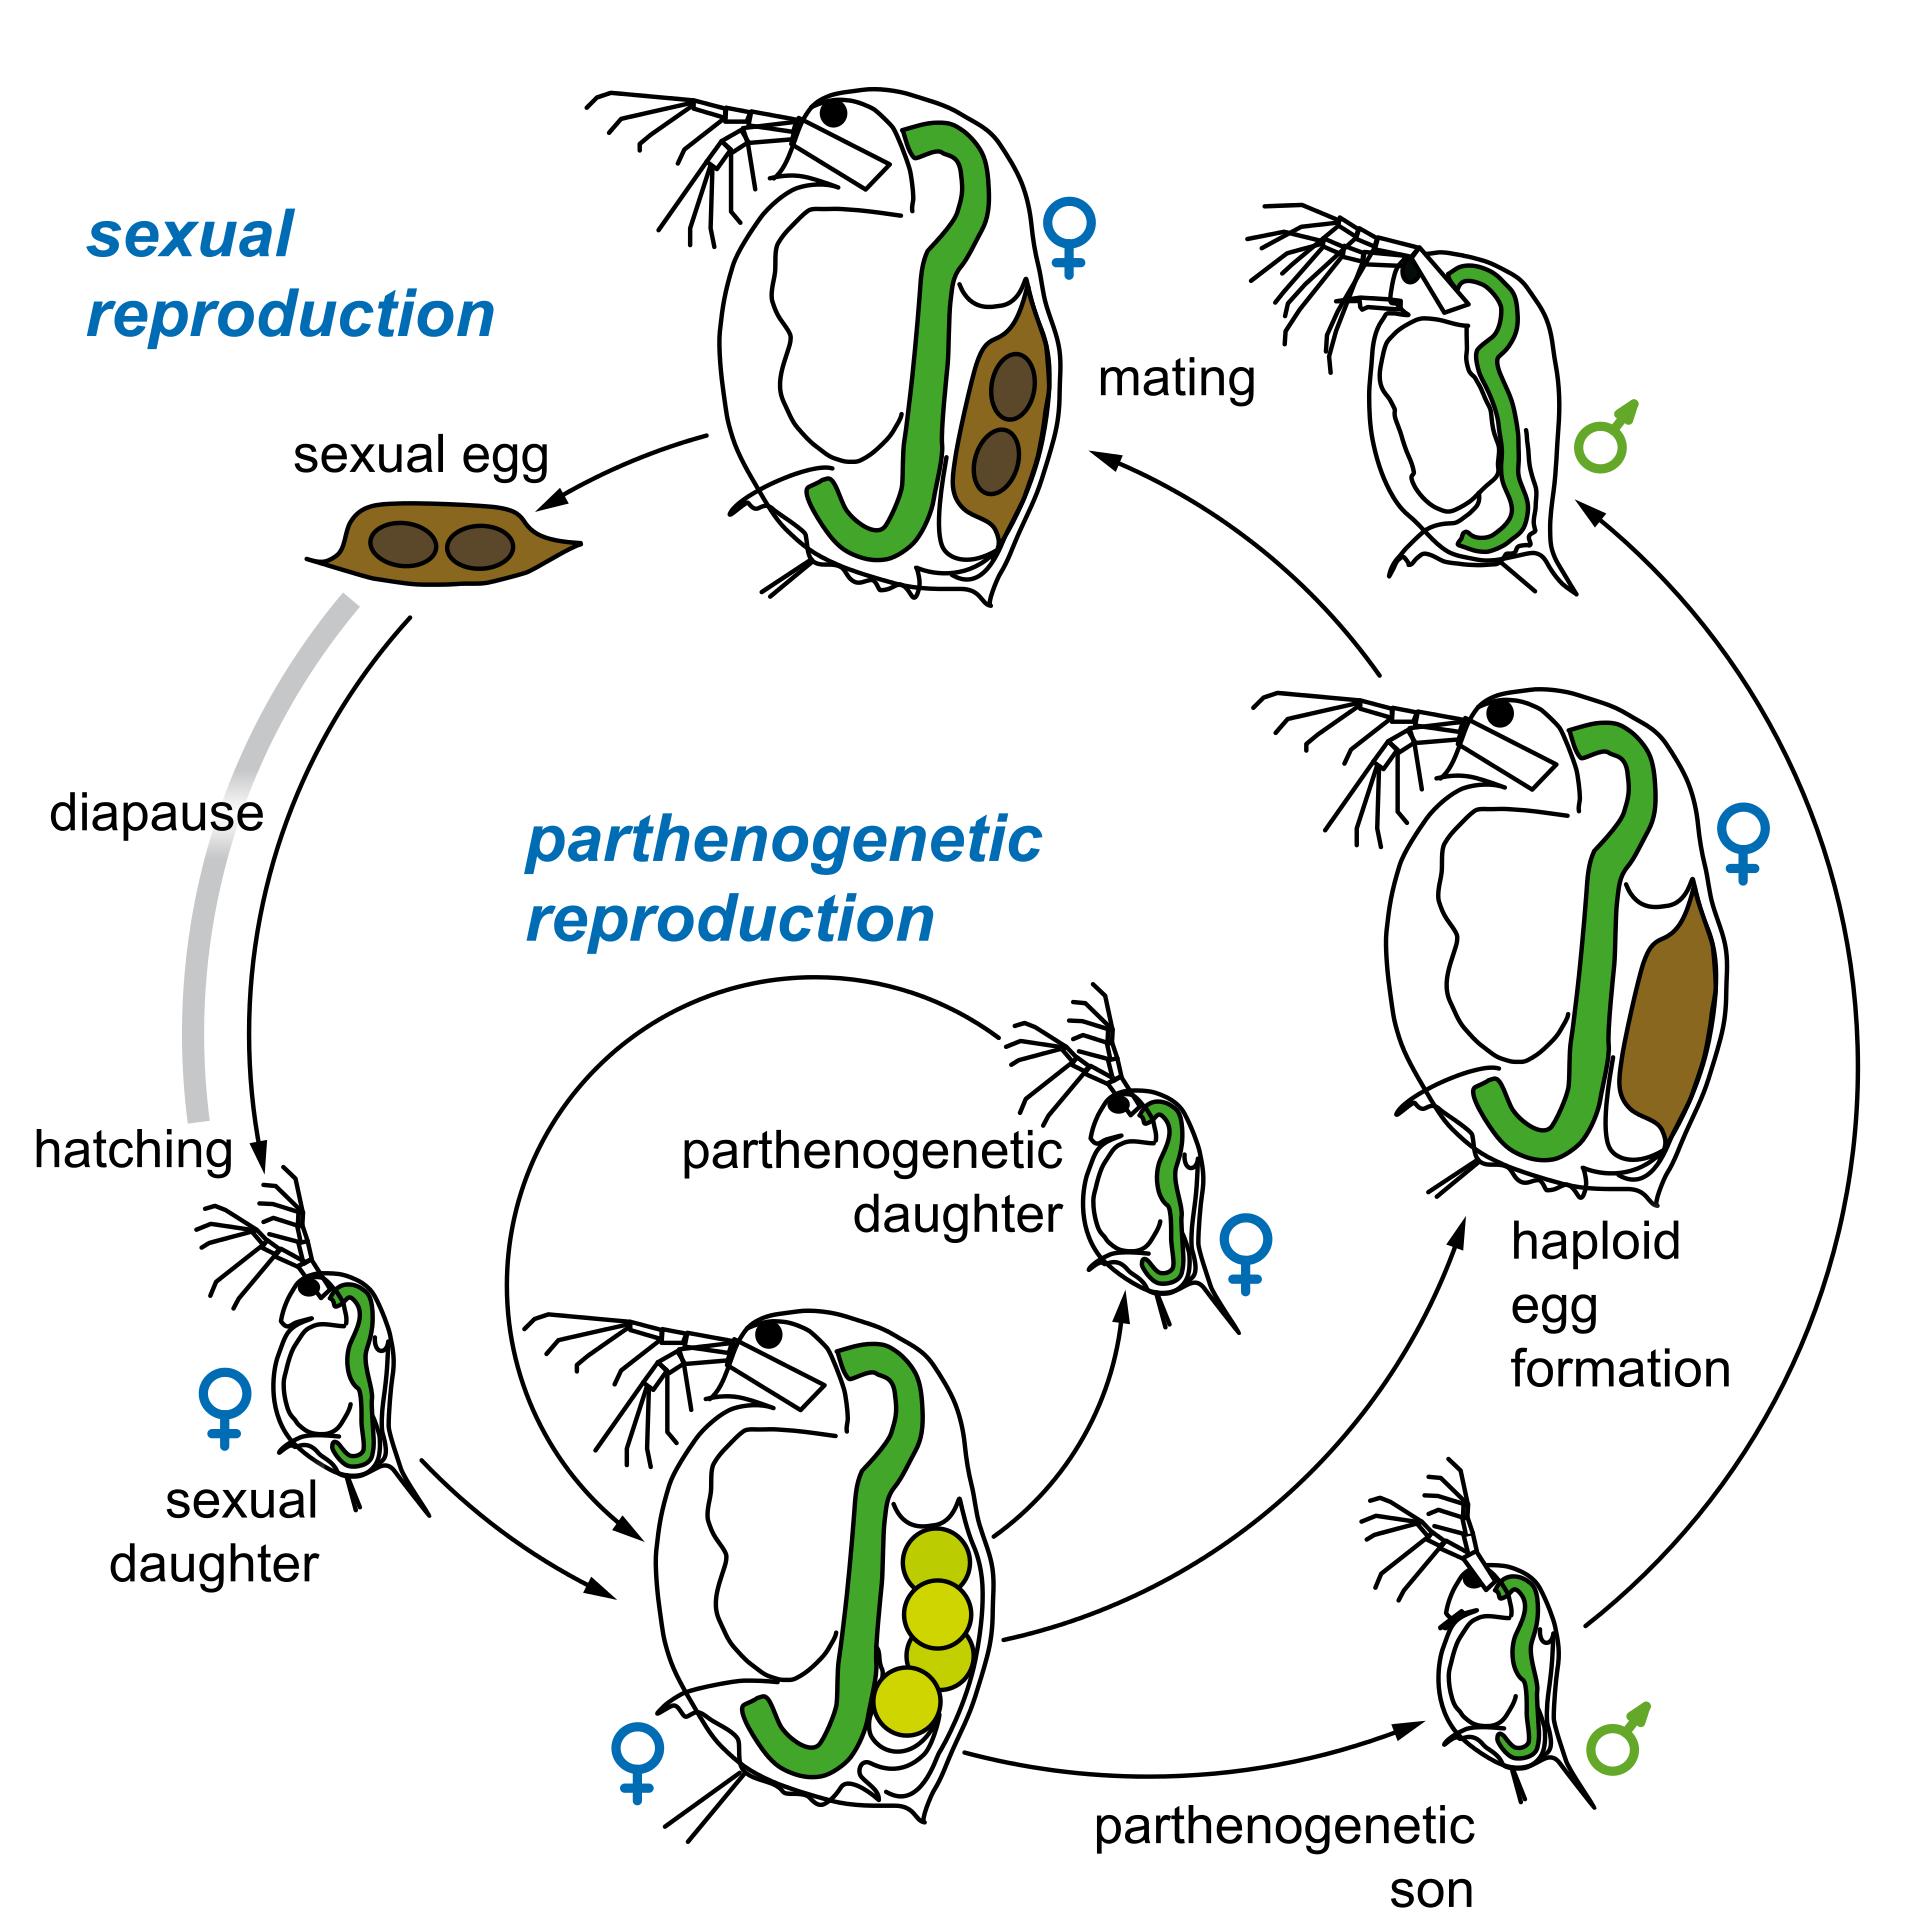 Daphnia Magna reproductive lifecycle